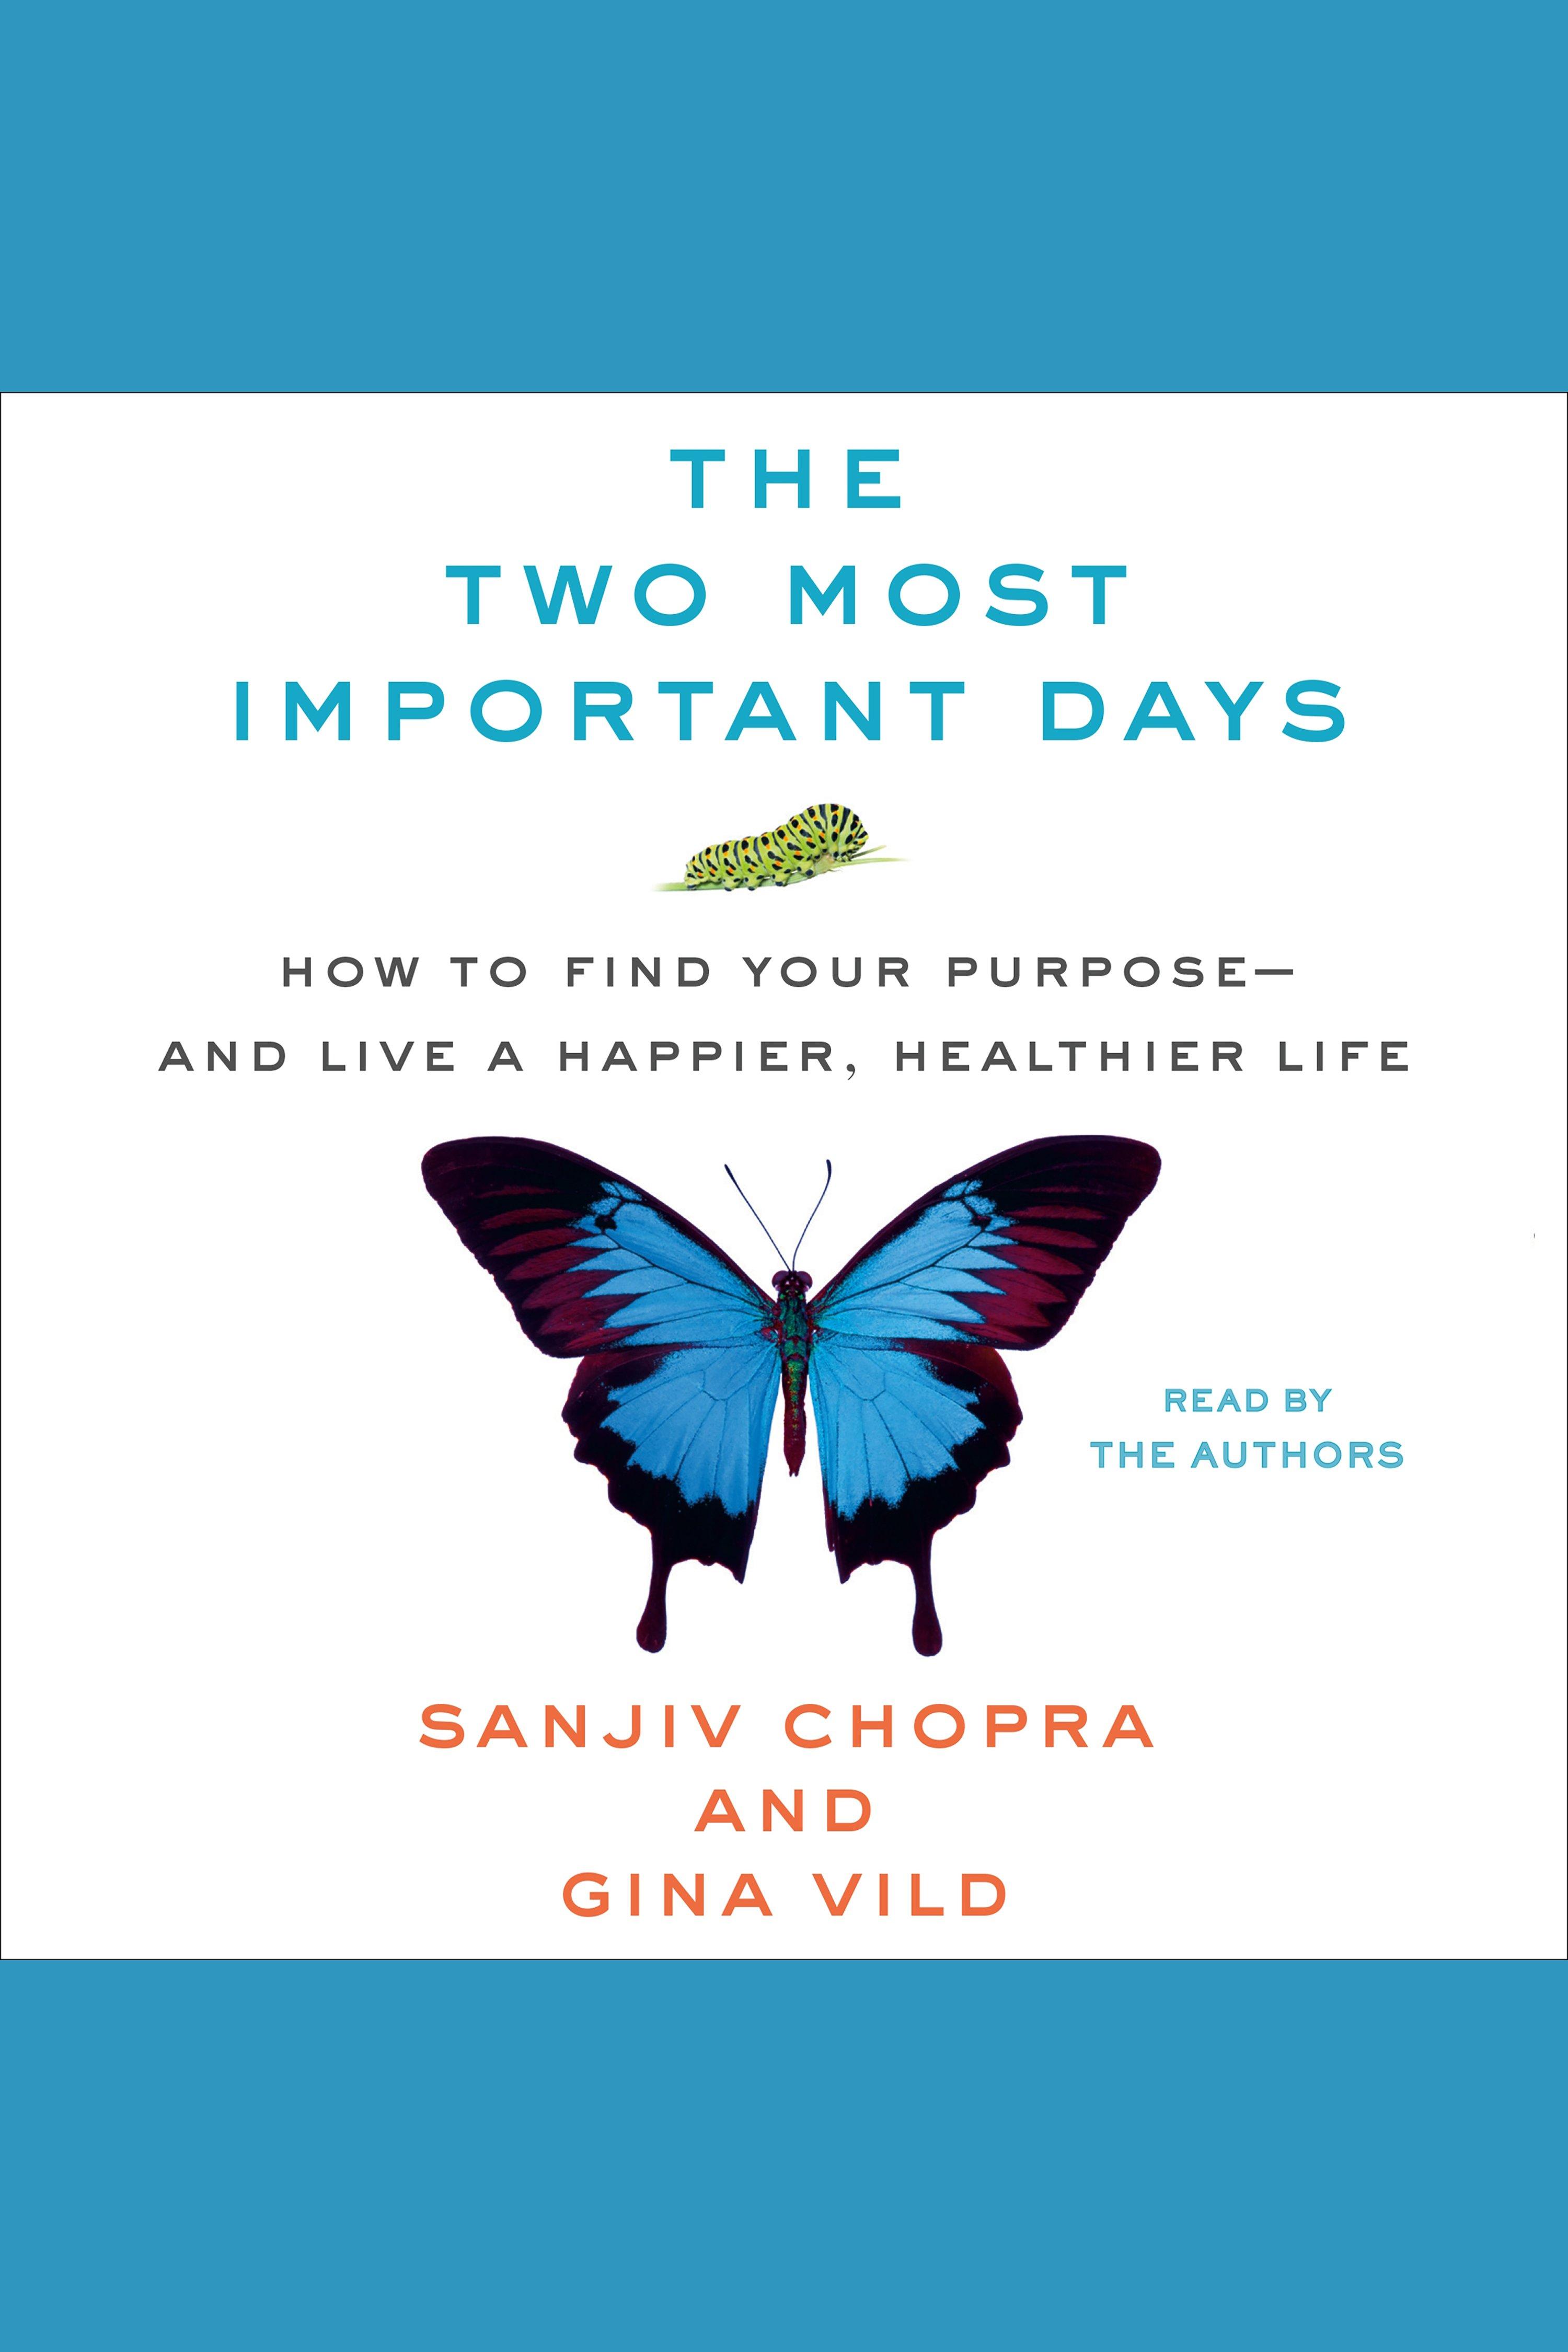 Esta es la portada del audiolibro Two Most Important Days, The